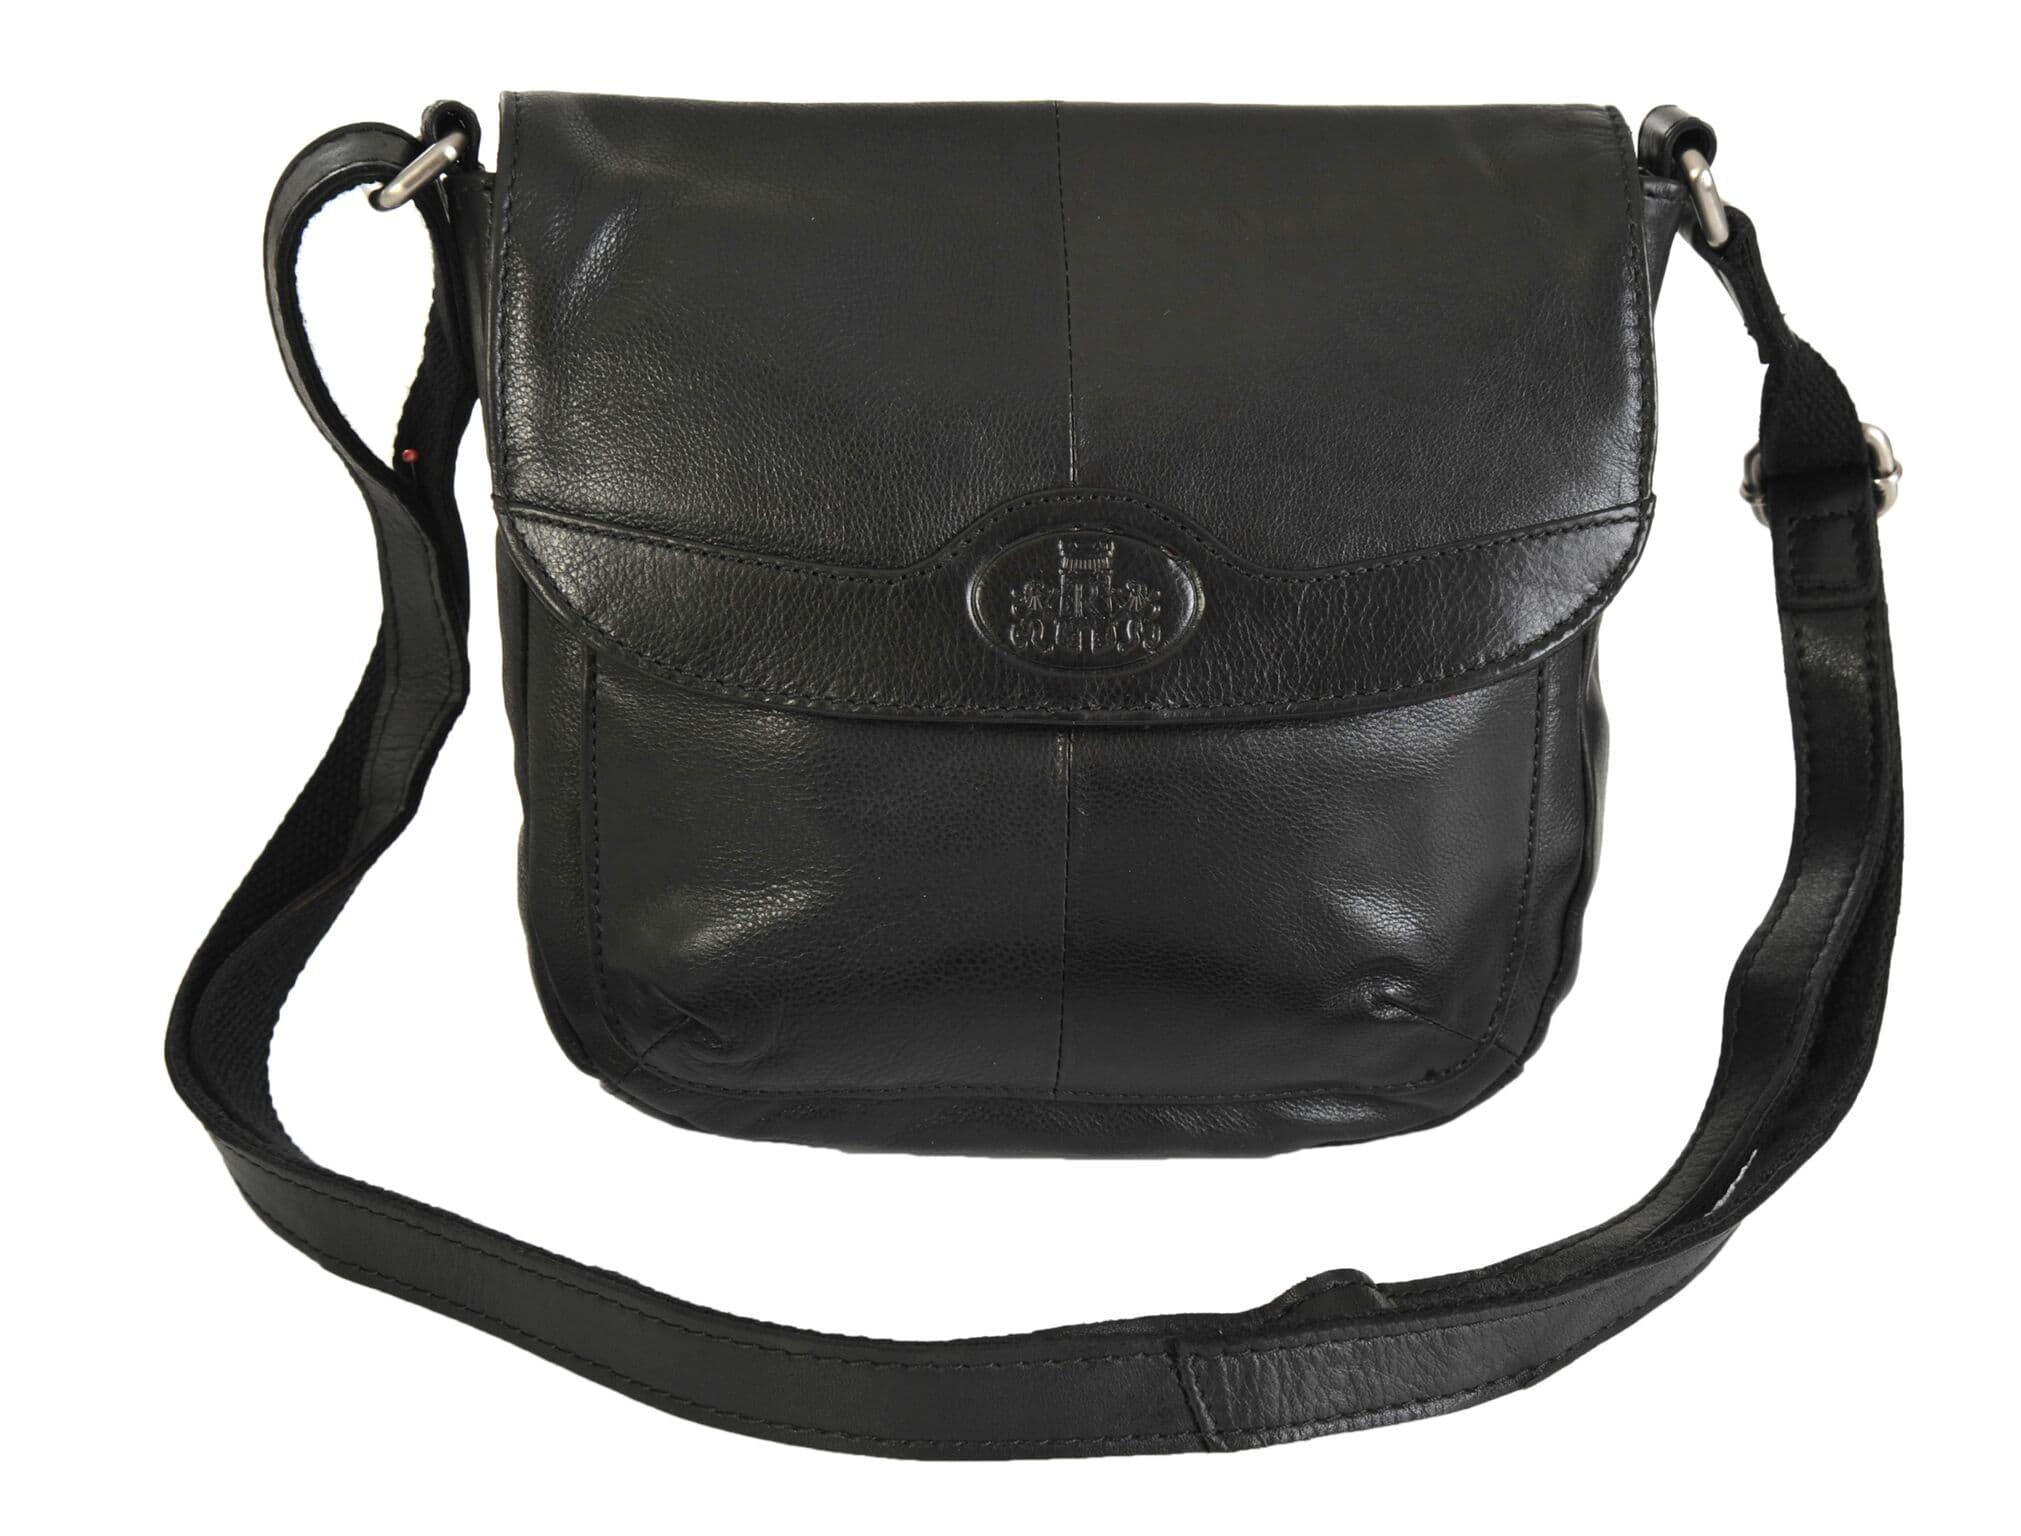 e4ac5a424e Rowallan Soft Black Small Leather Flap Shoulder Bag 9881 RRP £49.99 OUR  PRICE £39.99